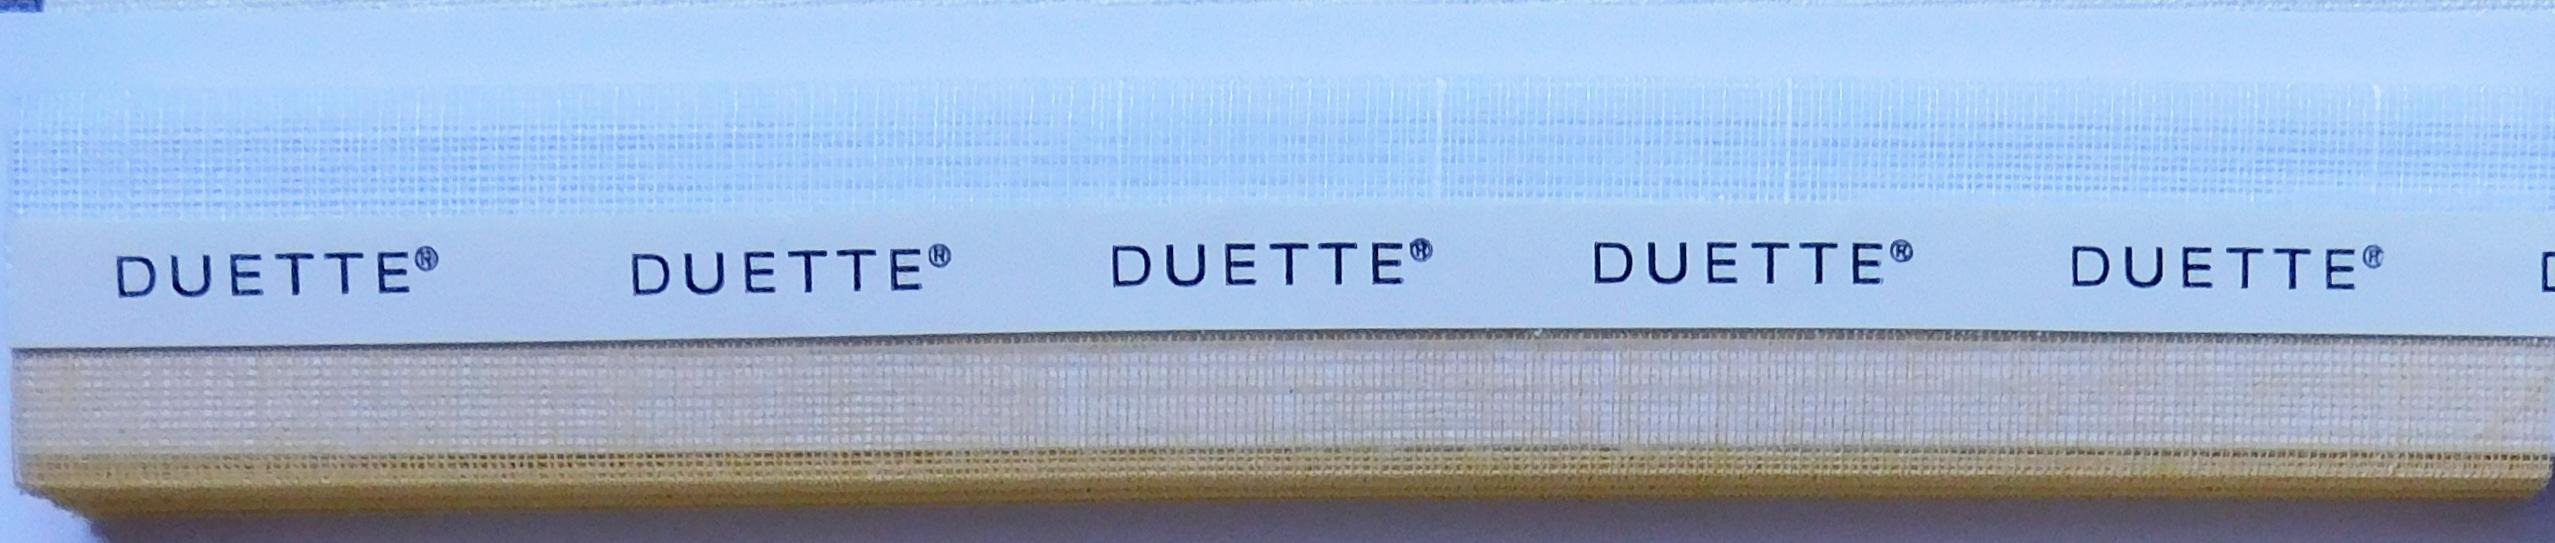 Batiste Sheer Tumblestone Duette Blind Fabric sample